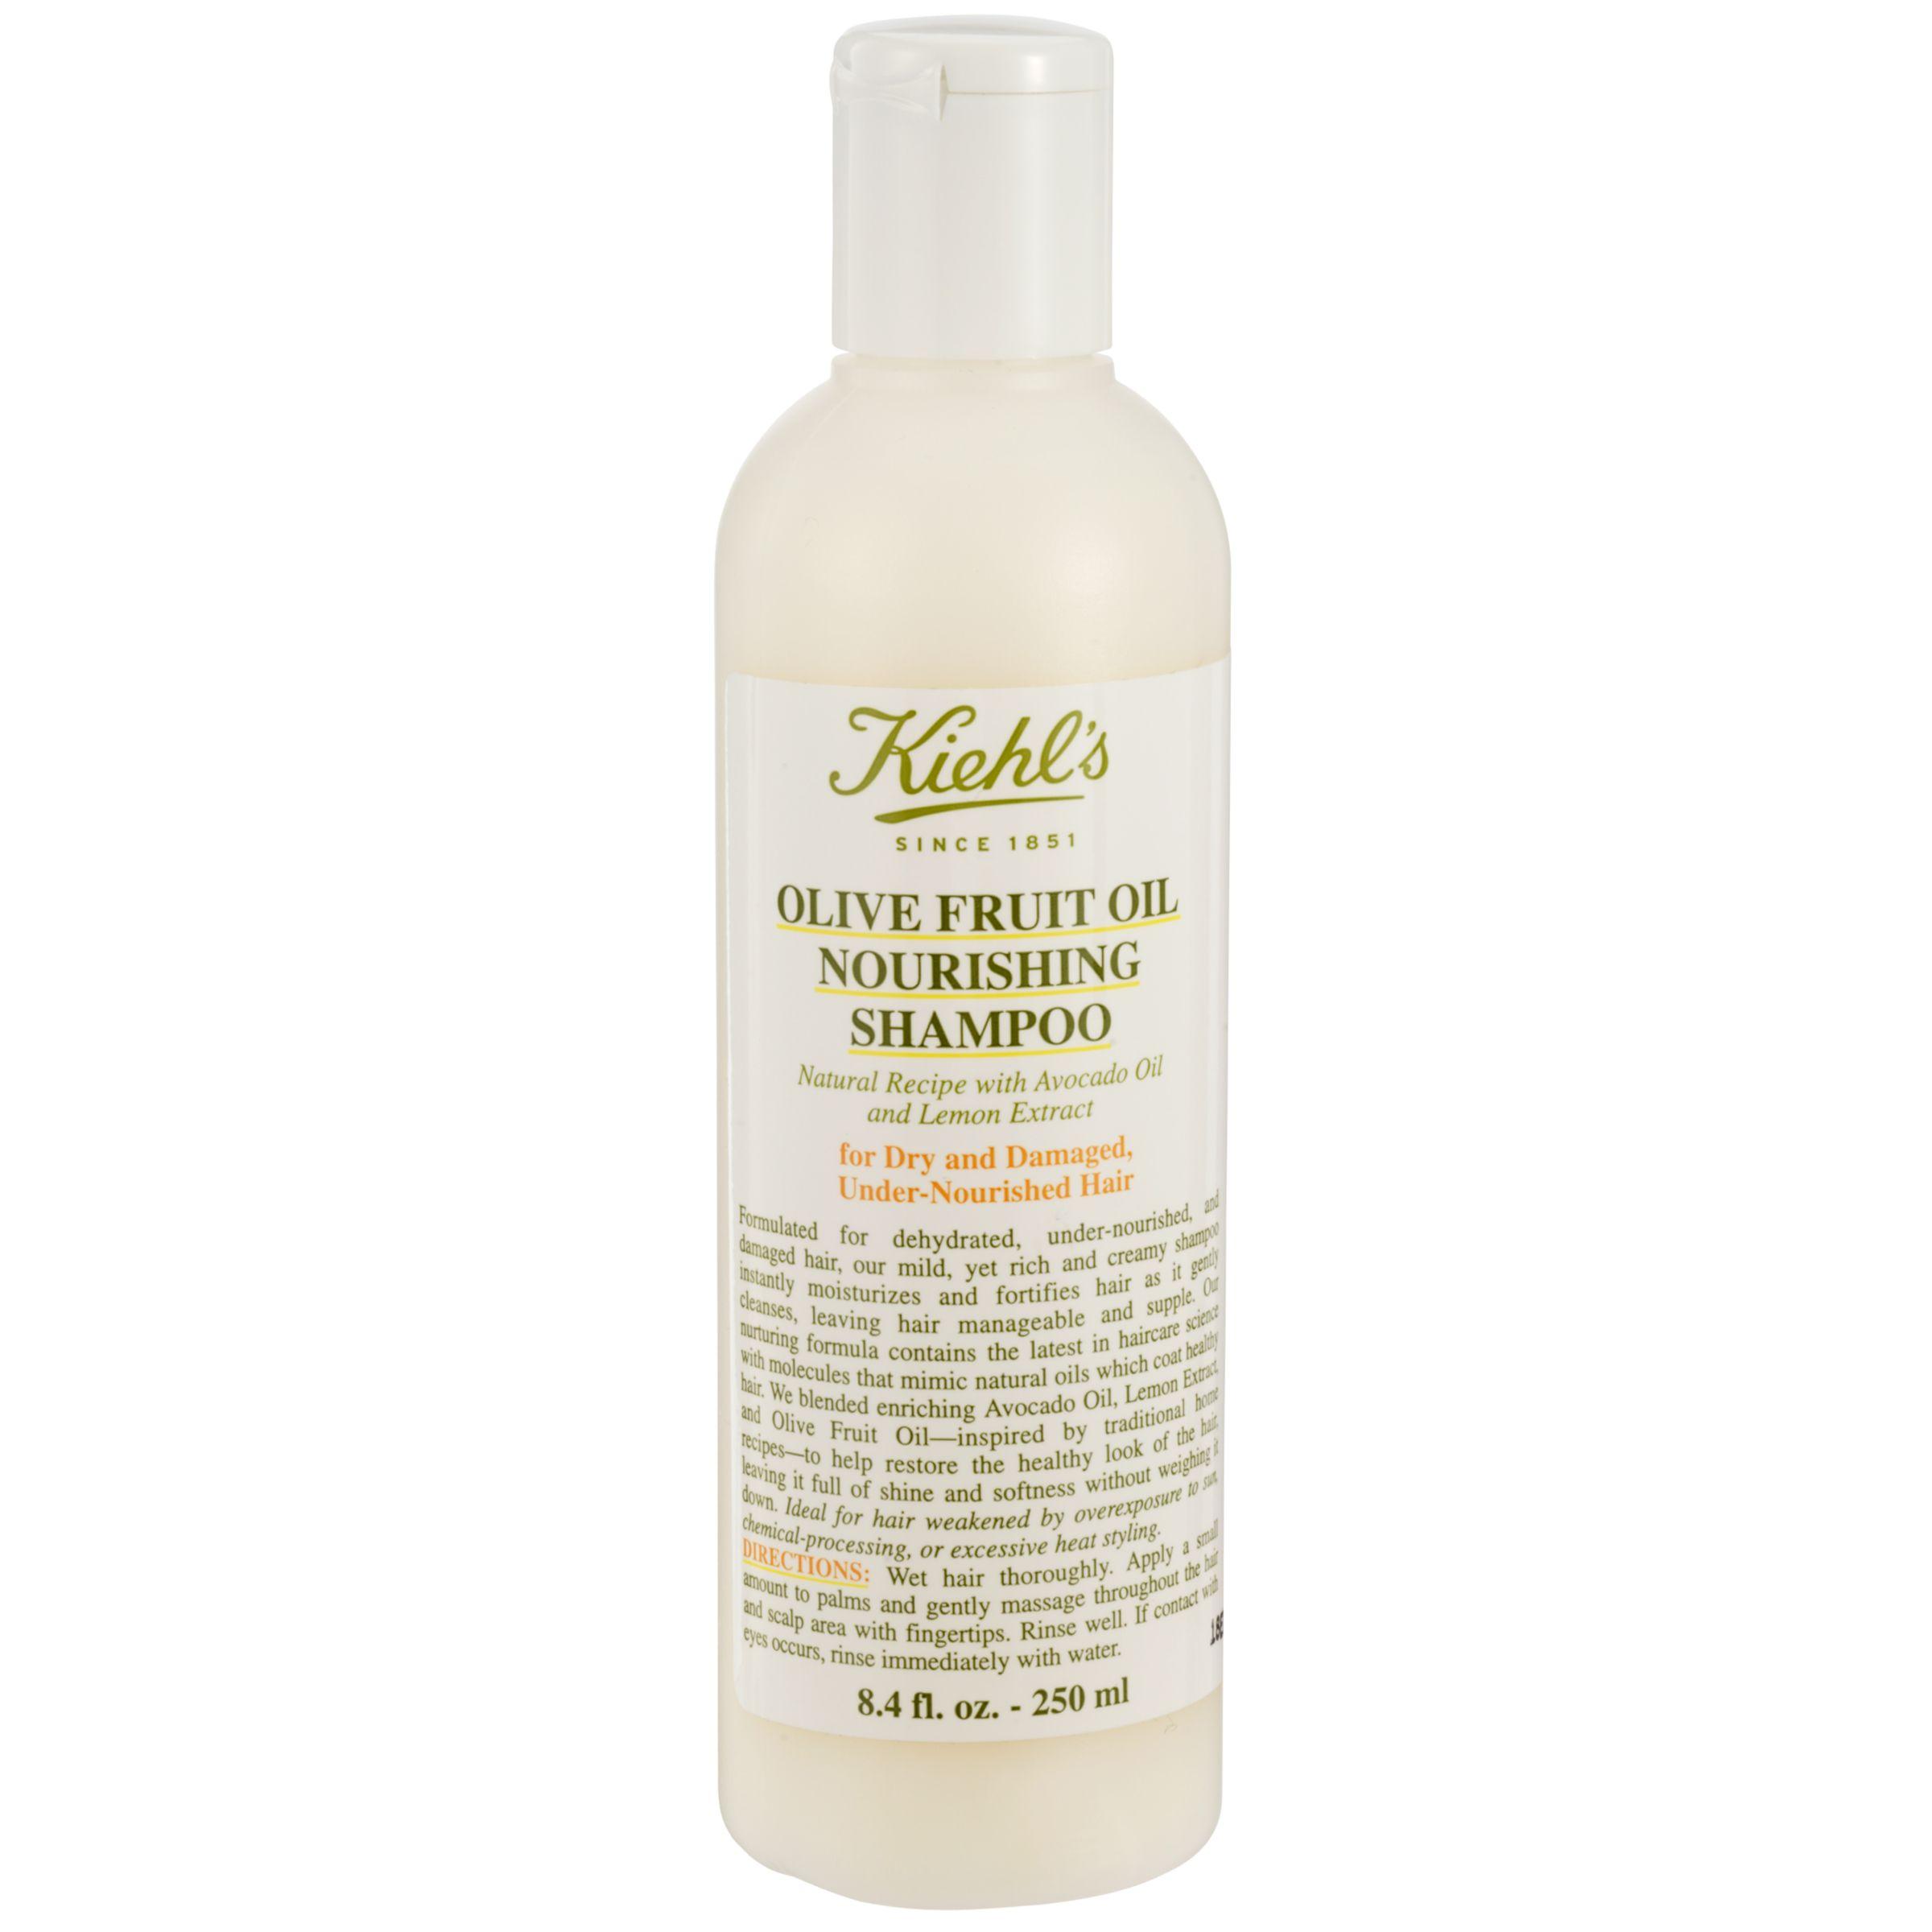 Kiehls Kiehl's Olive Fruit Oil Nourishing Shampoo